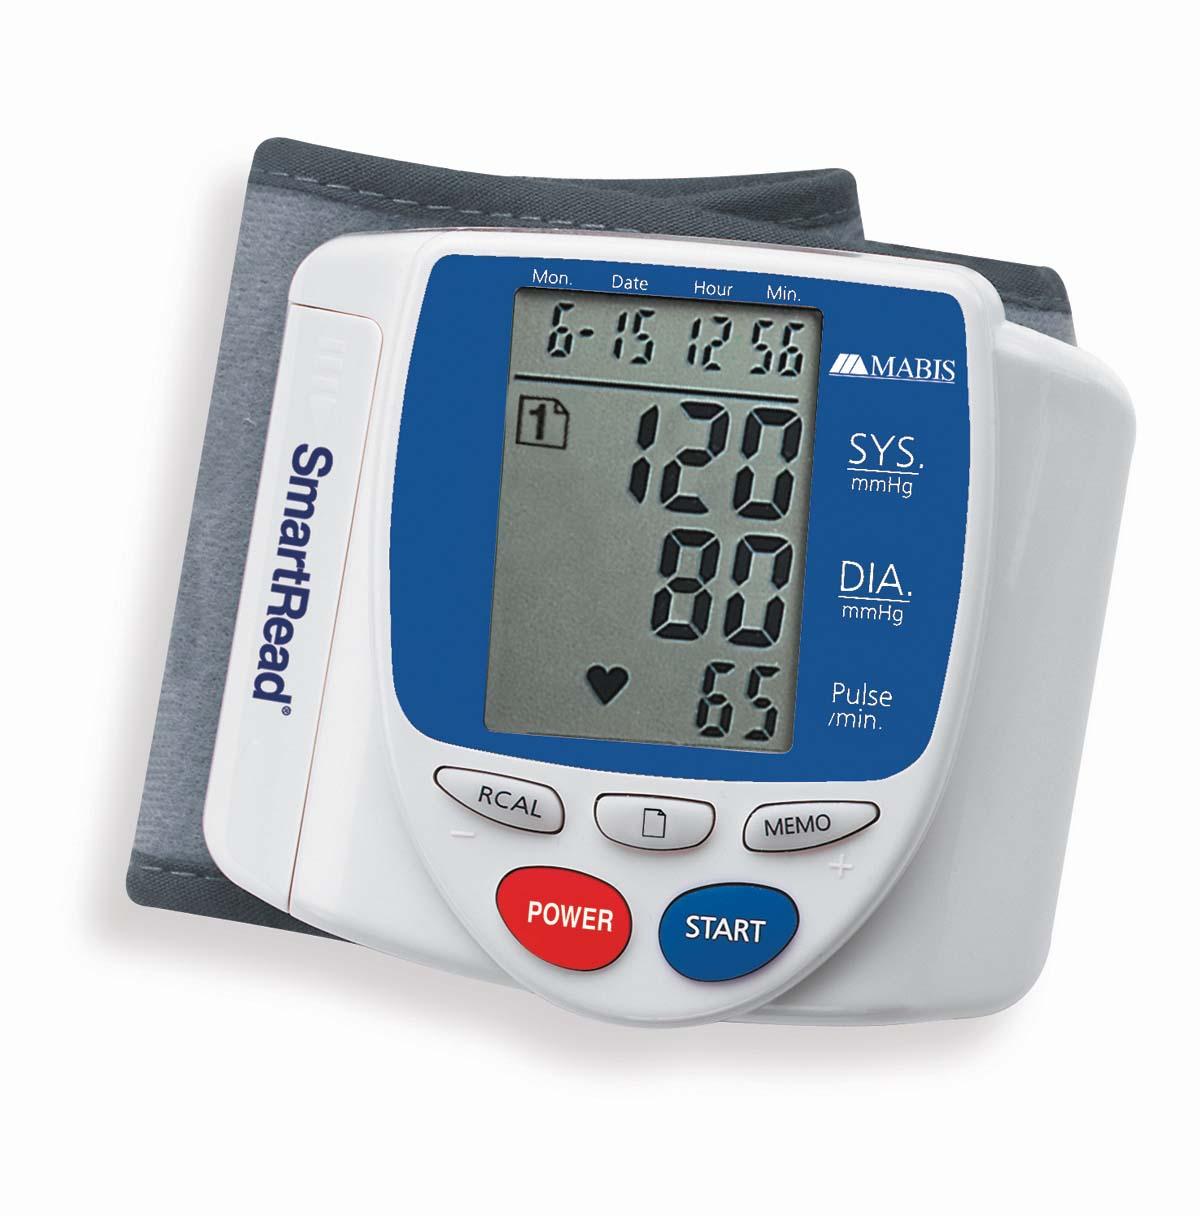 smartread-plus-automatic-digital-wrist-blood-pressure-monitor-with-memory-04-248-001-lr.jpg